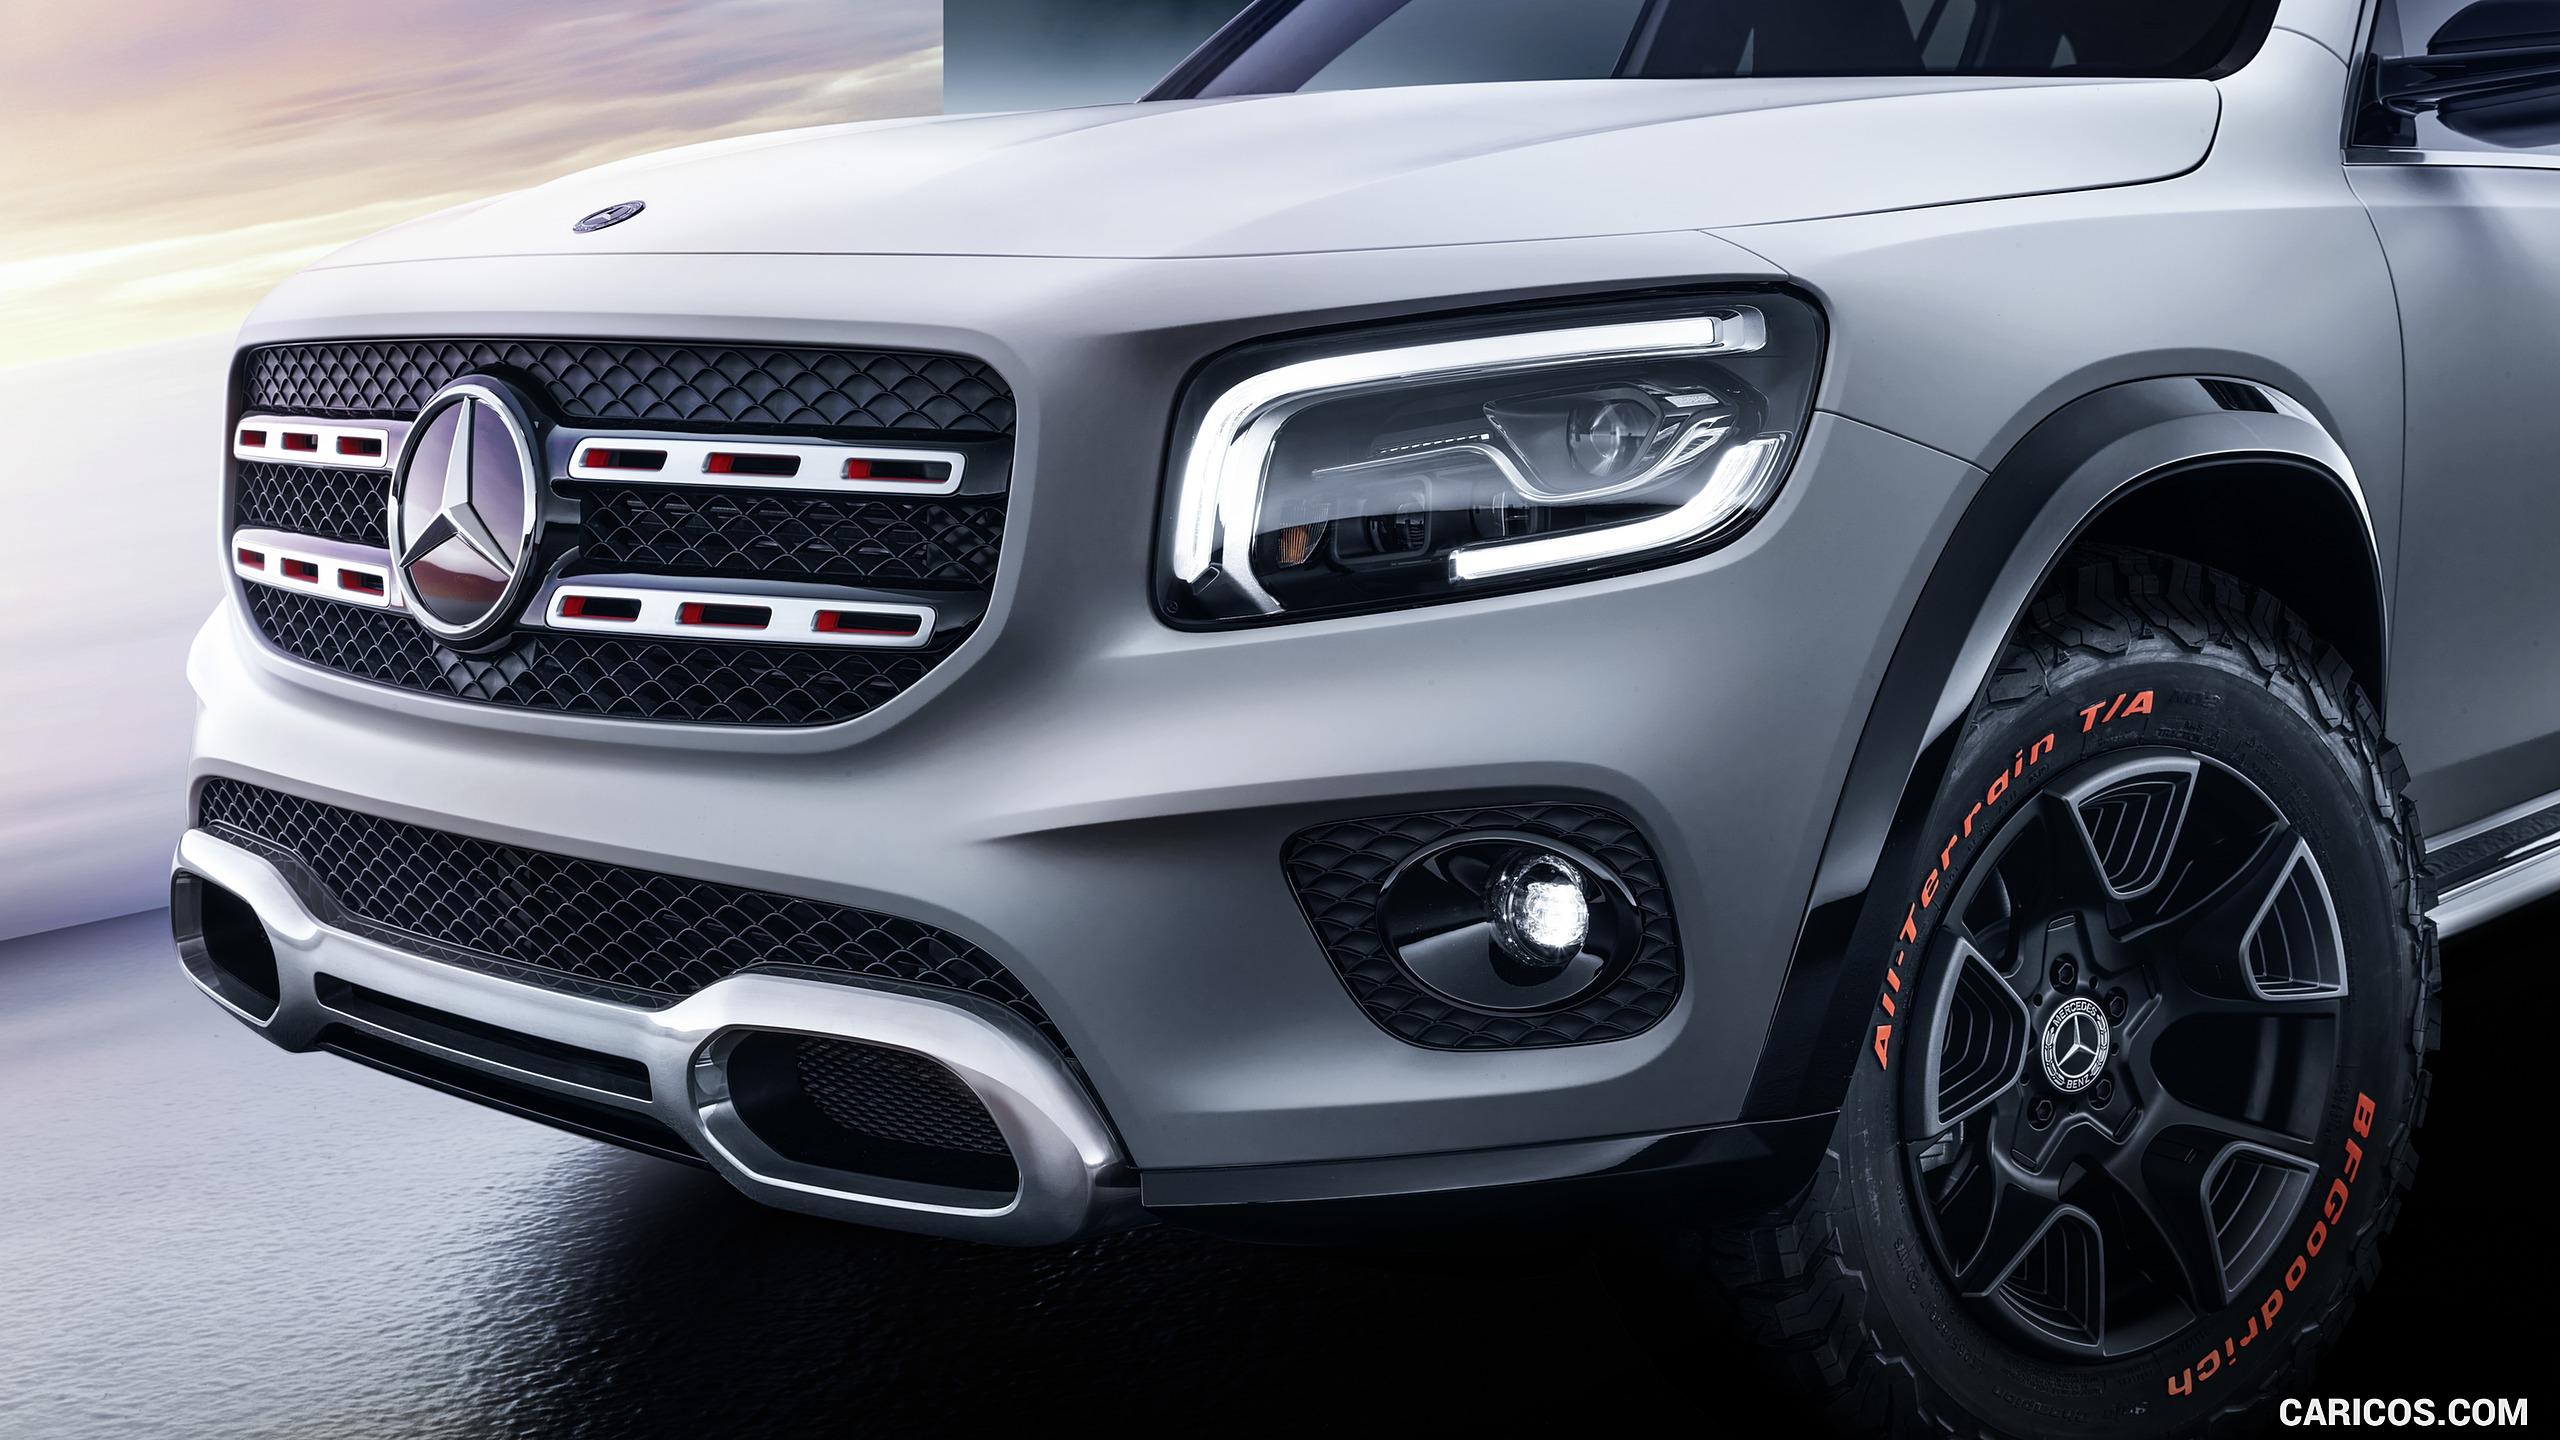 2019 Mercedes Benz GLB Concept   Headlight HD Wallpaper 8 2560x1440